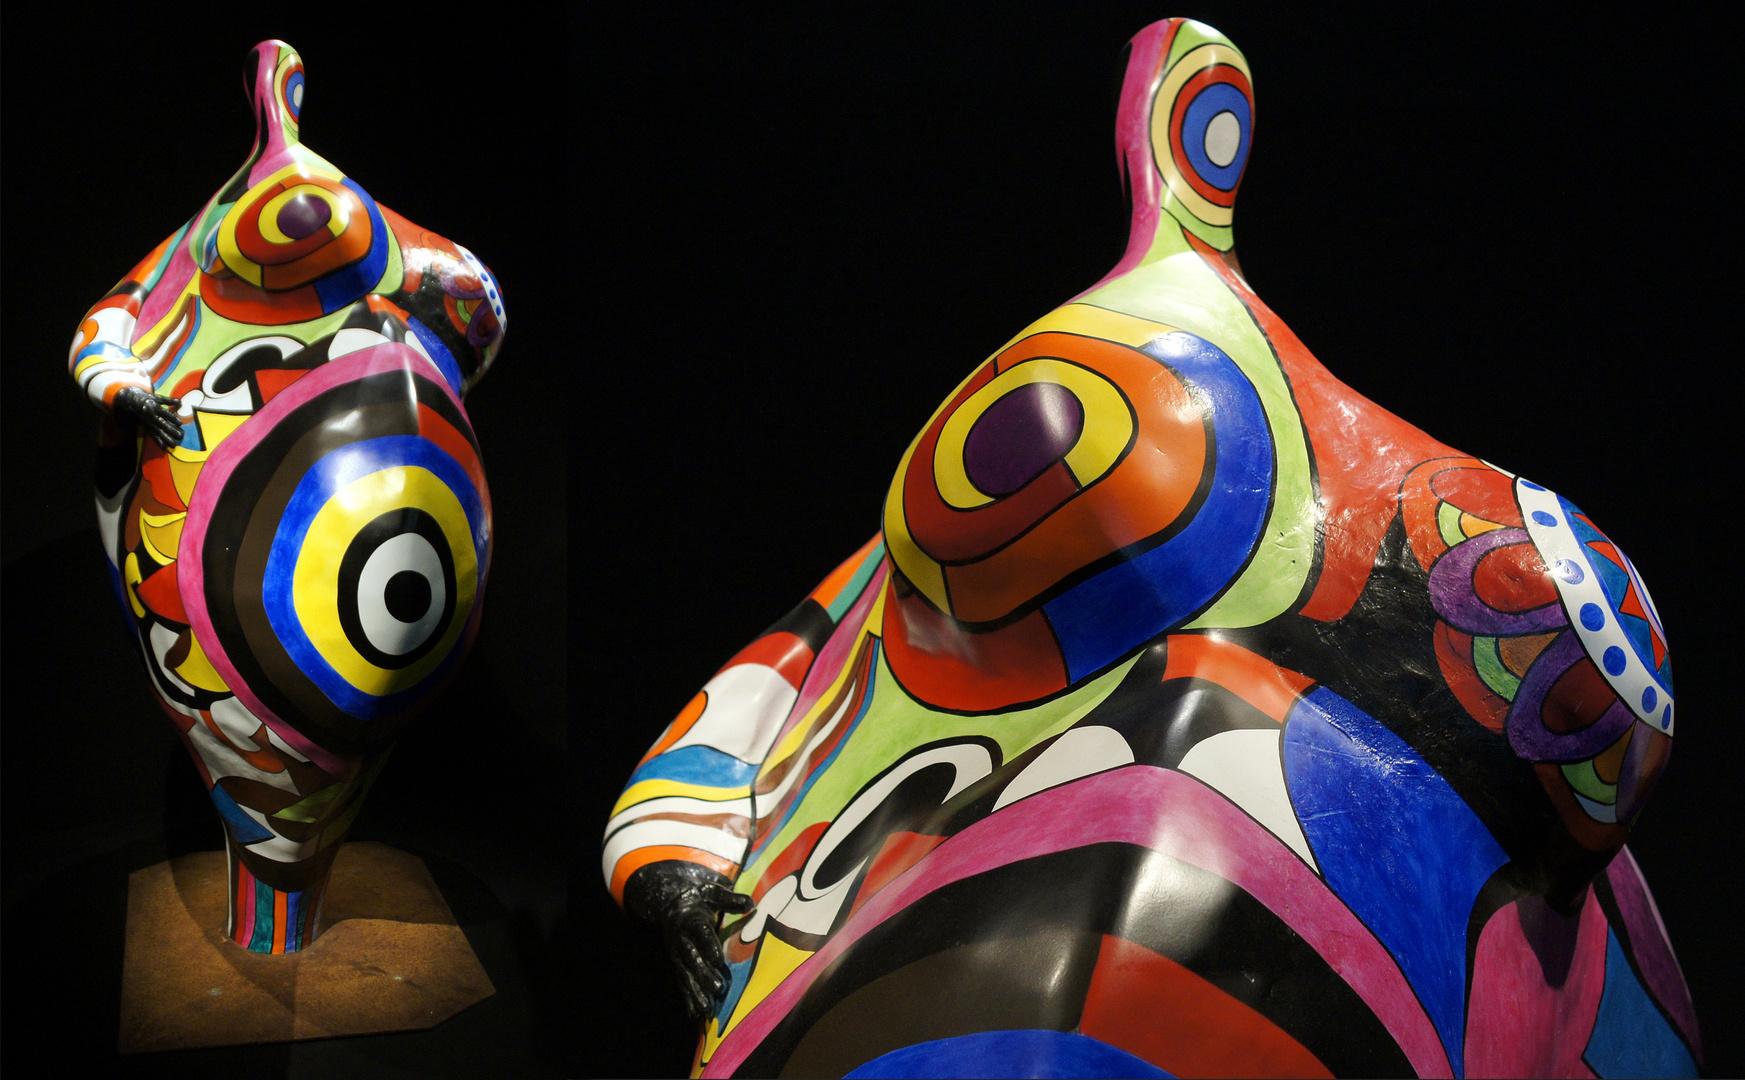 Niki de Saint Phalle: Nana Gwendolyn (1966)